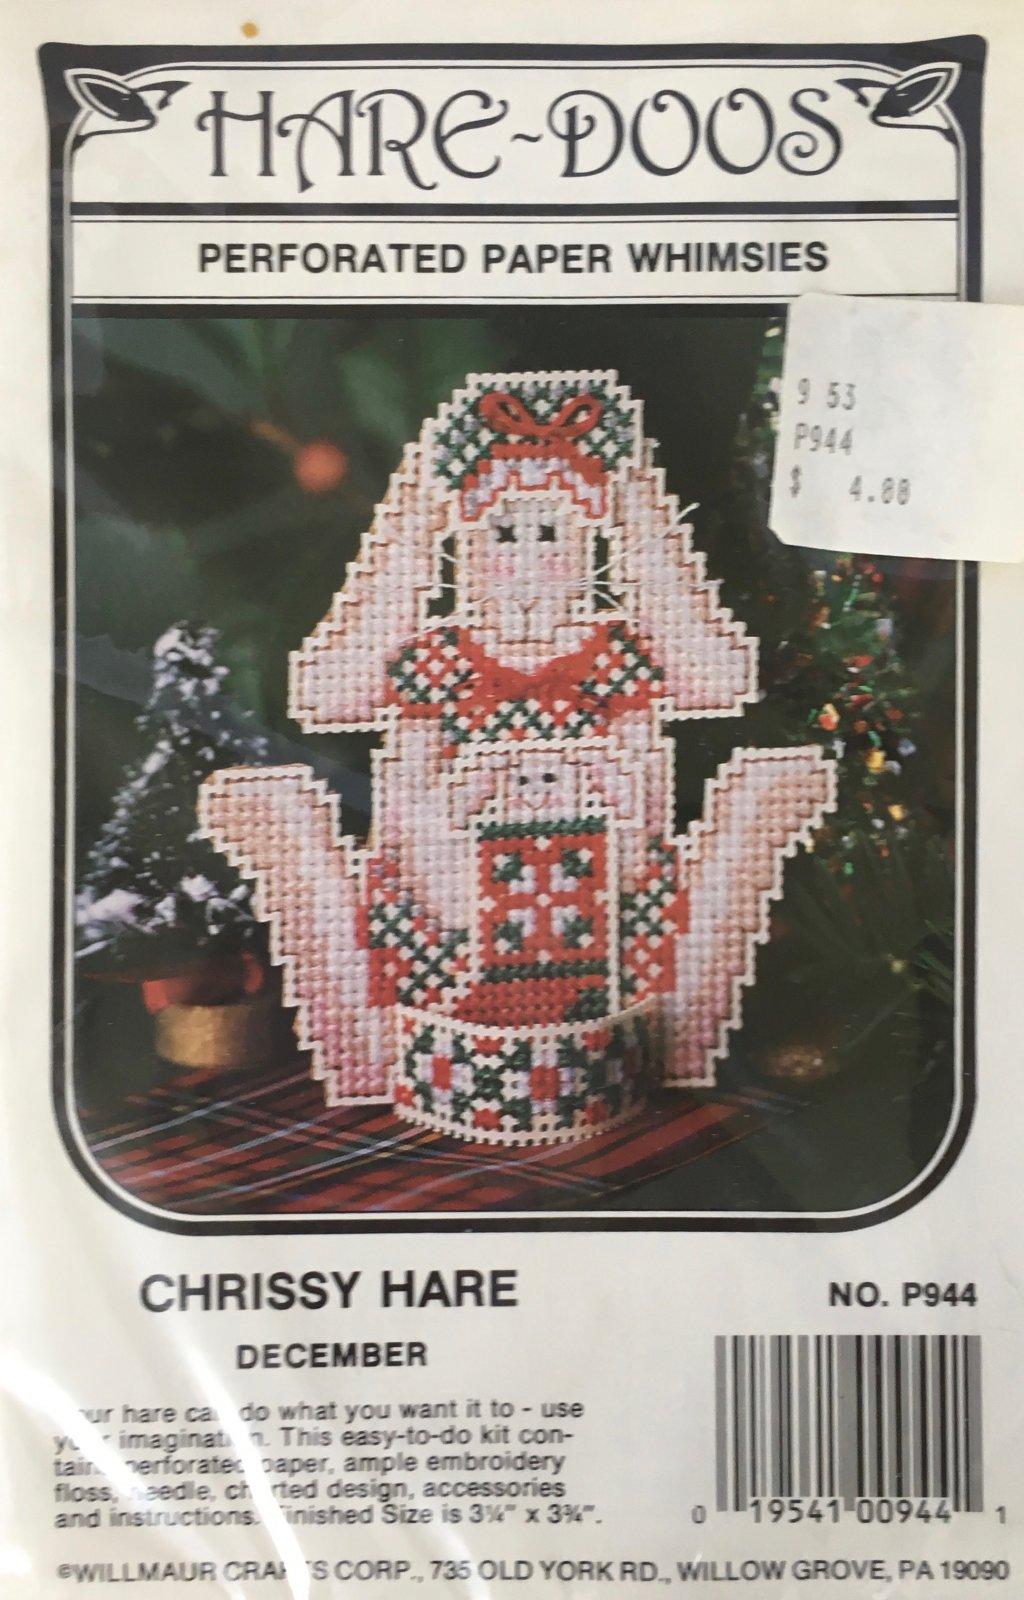 Astor Place: Hare-Doos Chrissy Hare Kit December P944